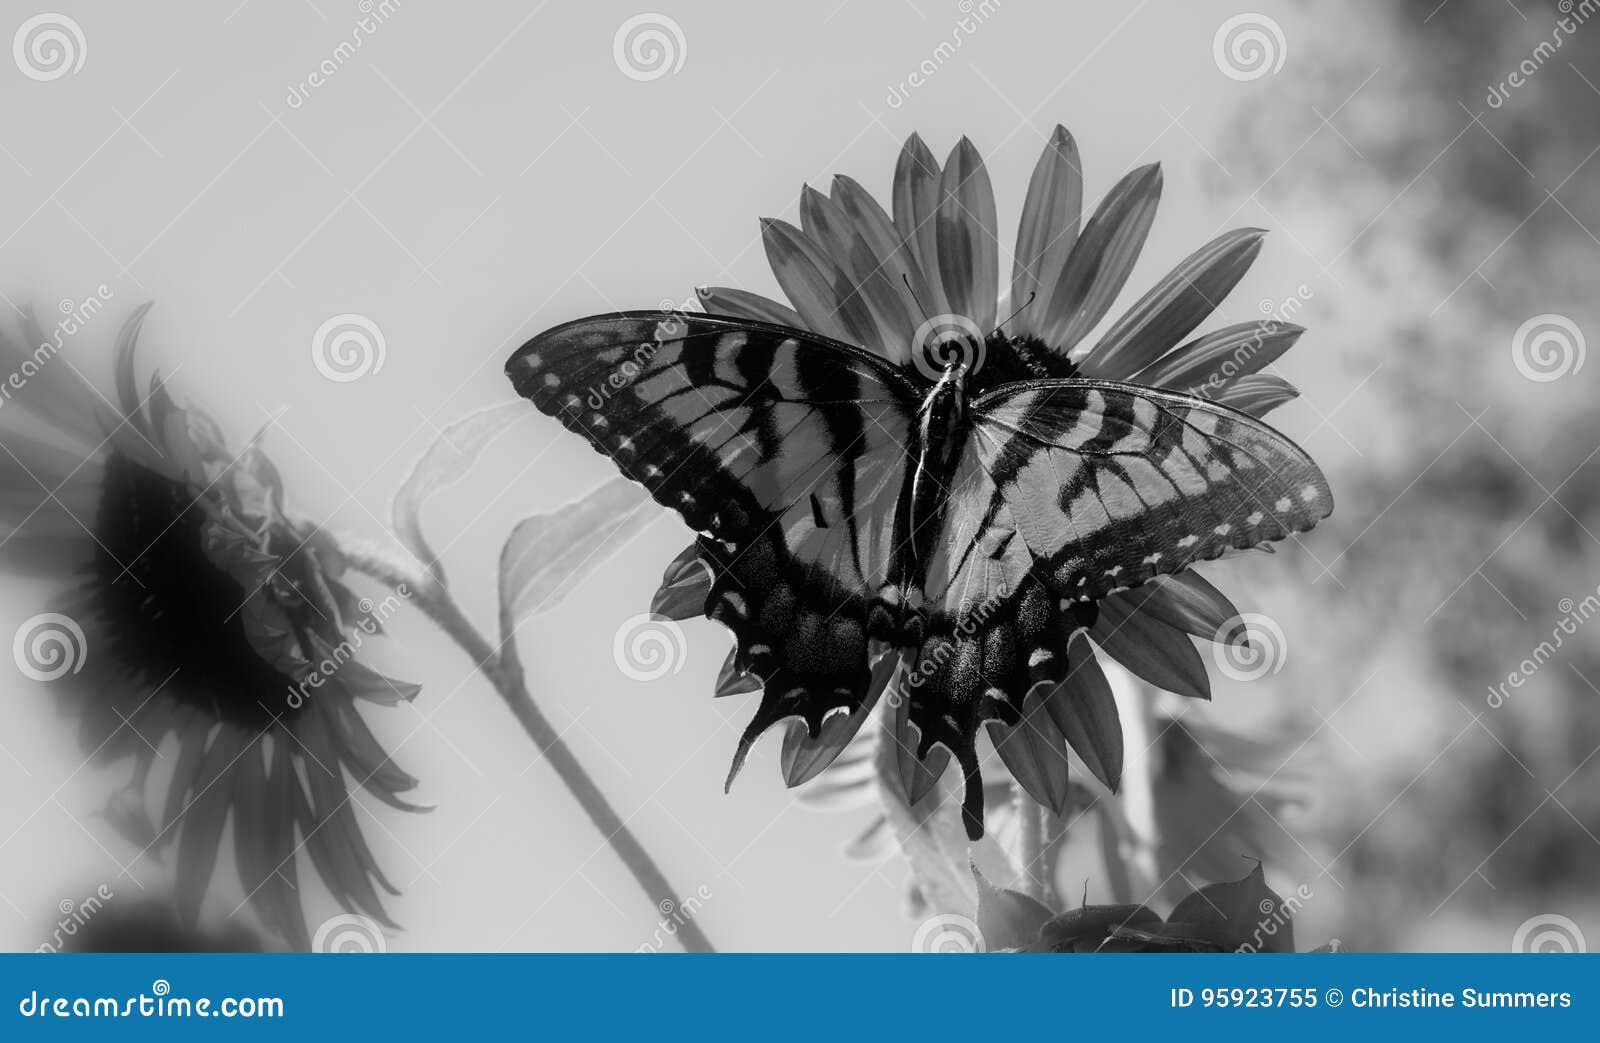 Der hungrige Schmetterling